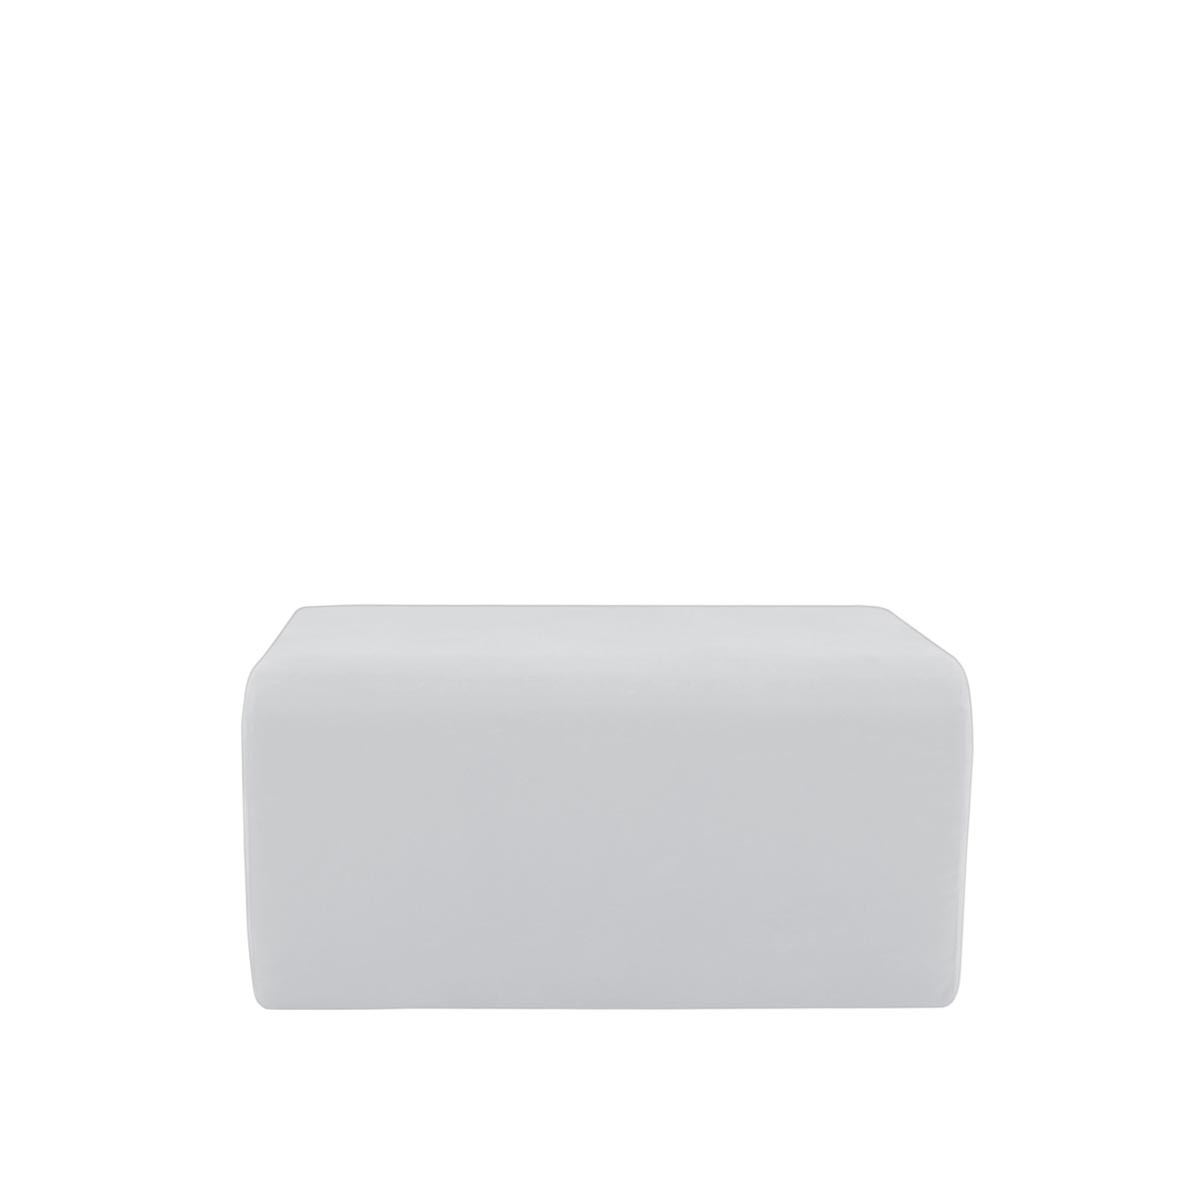 Pufe Muss R02 Tecido Lonita Branco 01